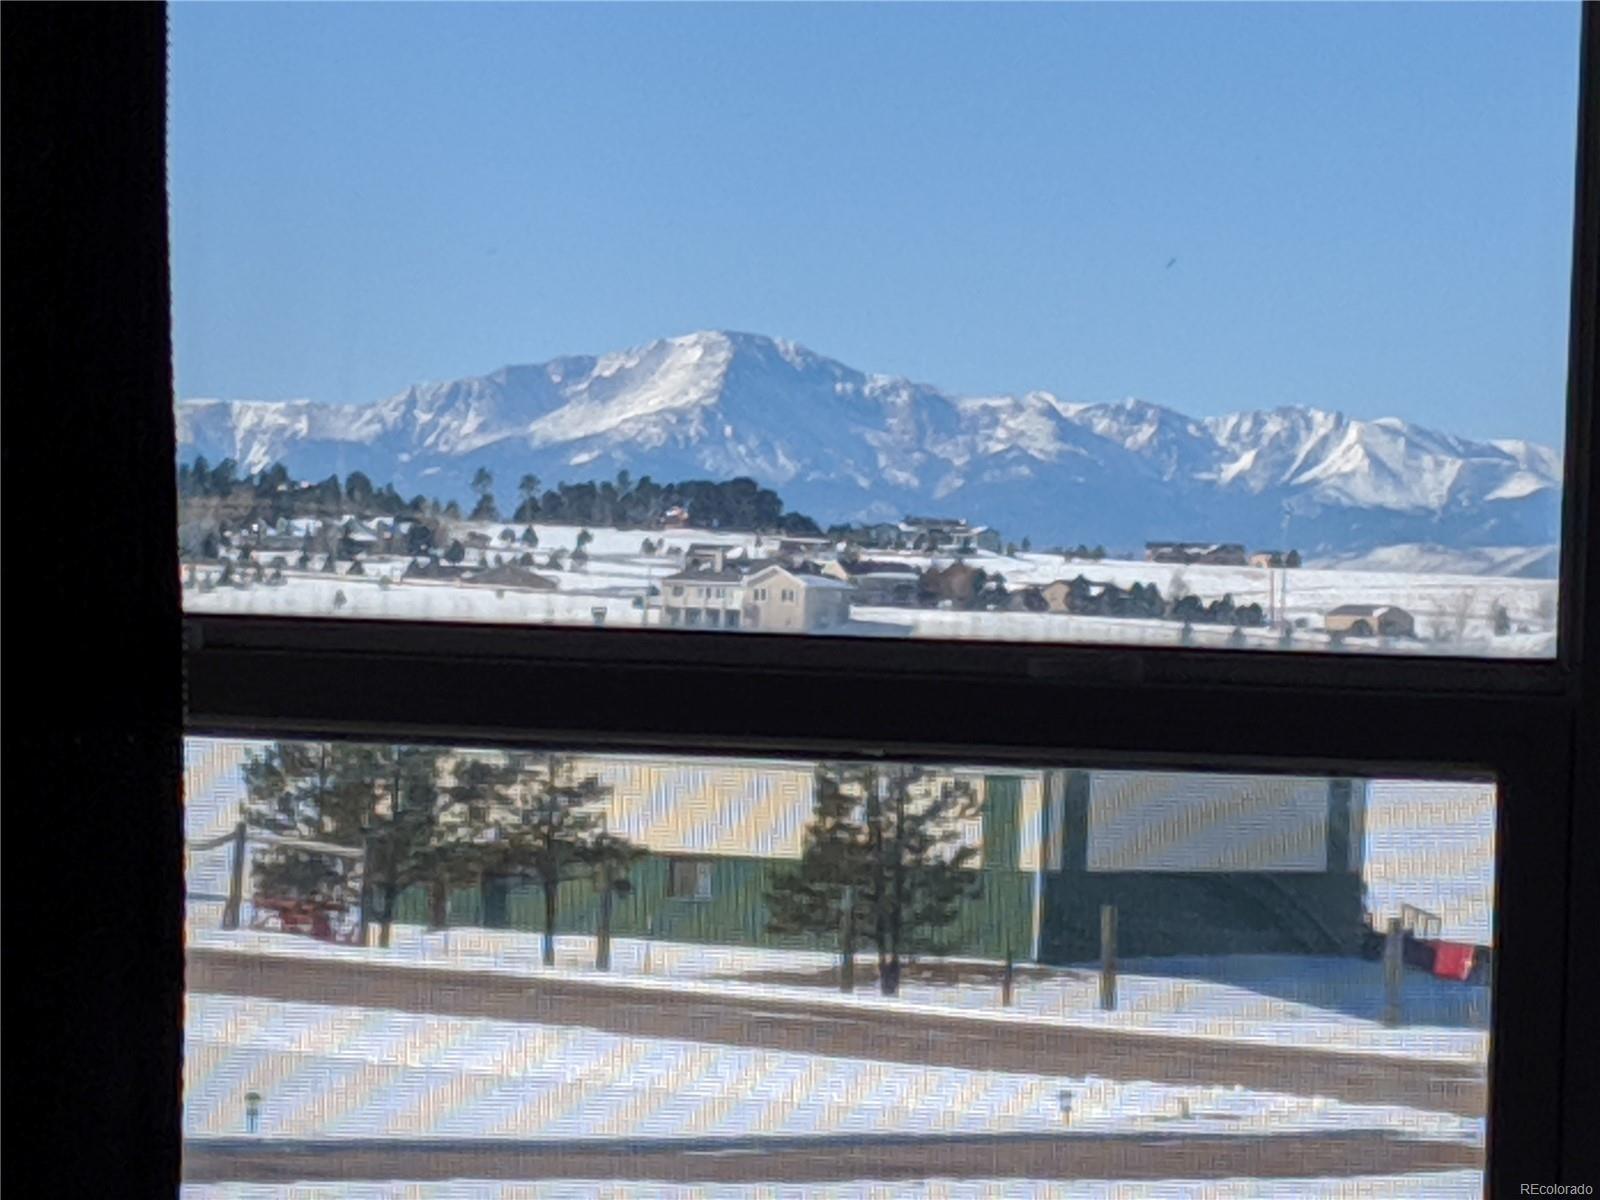 MLS# 4807349 - 32 - 15325 Terra Ridge Circle, Colorado Springs, CO 80908